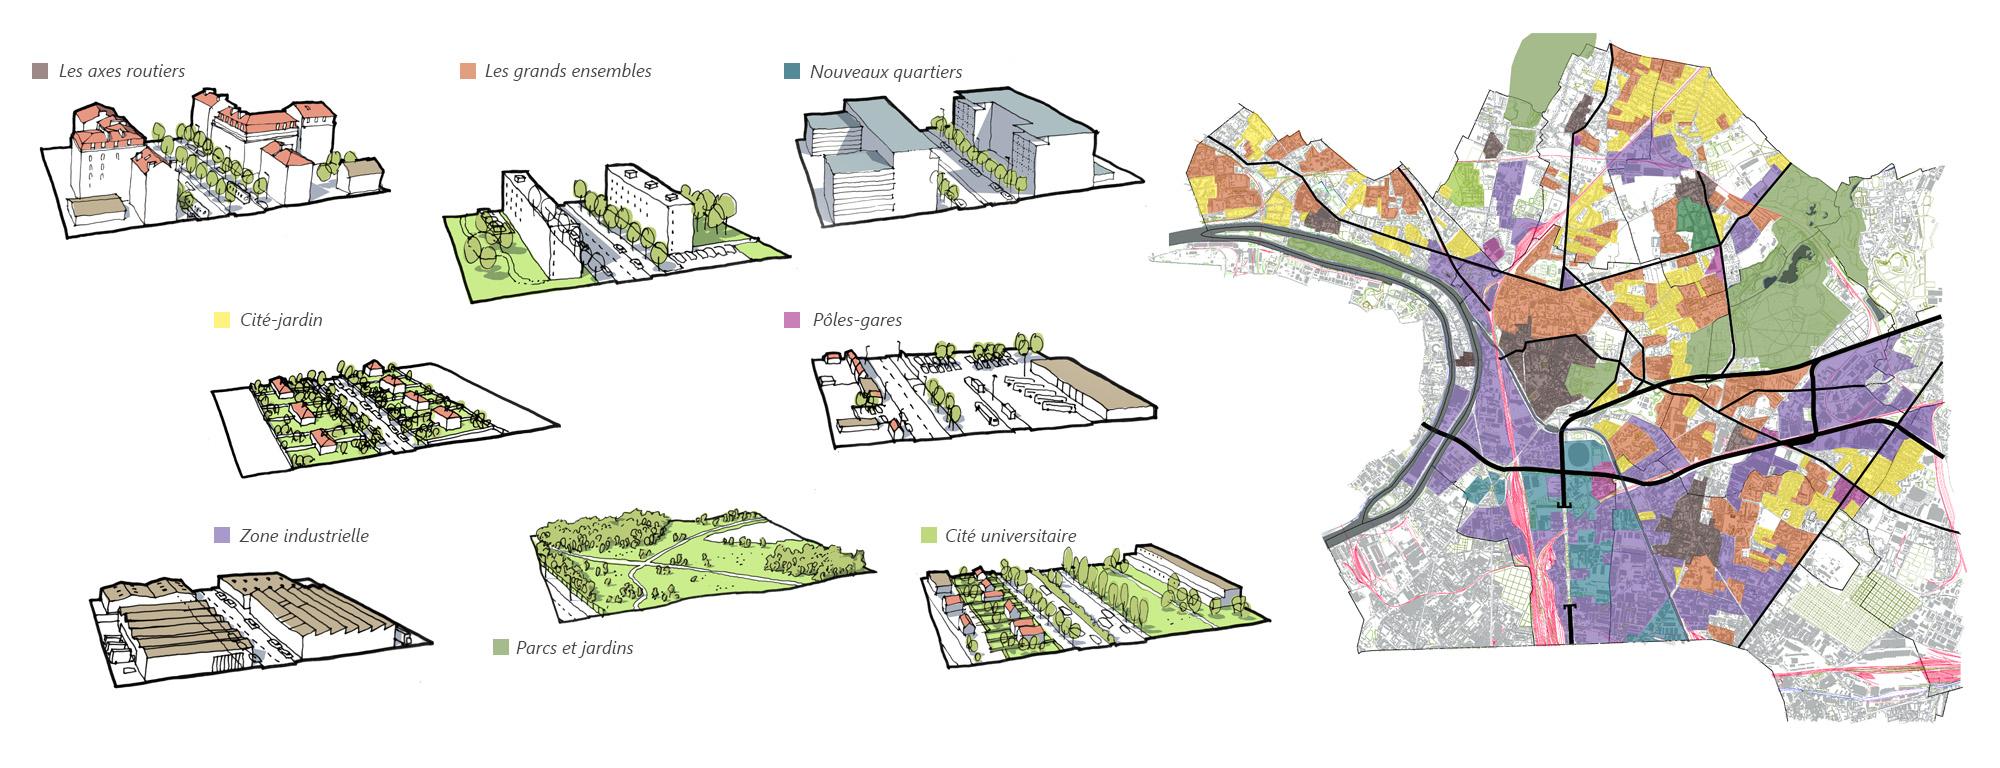 Différentes typologies du paysage urbain